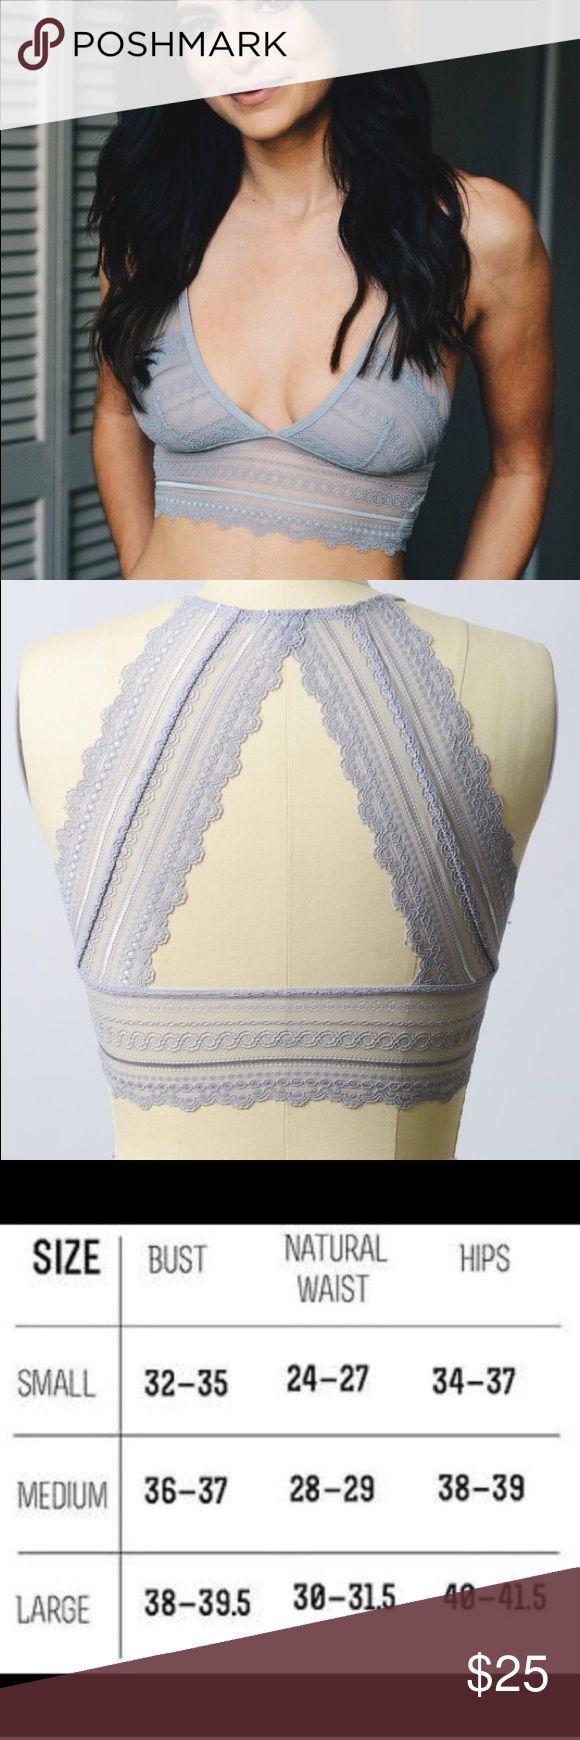 Scalloped lace keyhole longline Bralette lace trim Brand new / 92% nylon 8% spandex/ no trades/ not aloe brand / also sold at ⭐️ breathofyouth.com ALO Yoga Intimates & Sleepwear Bandeaus